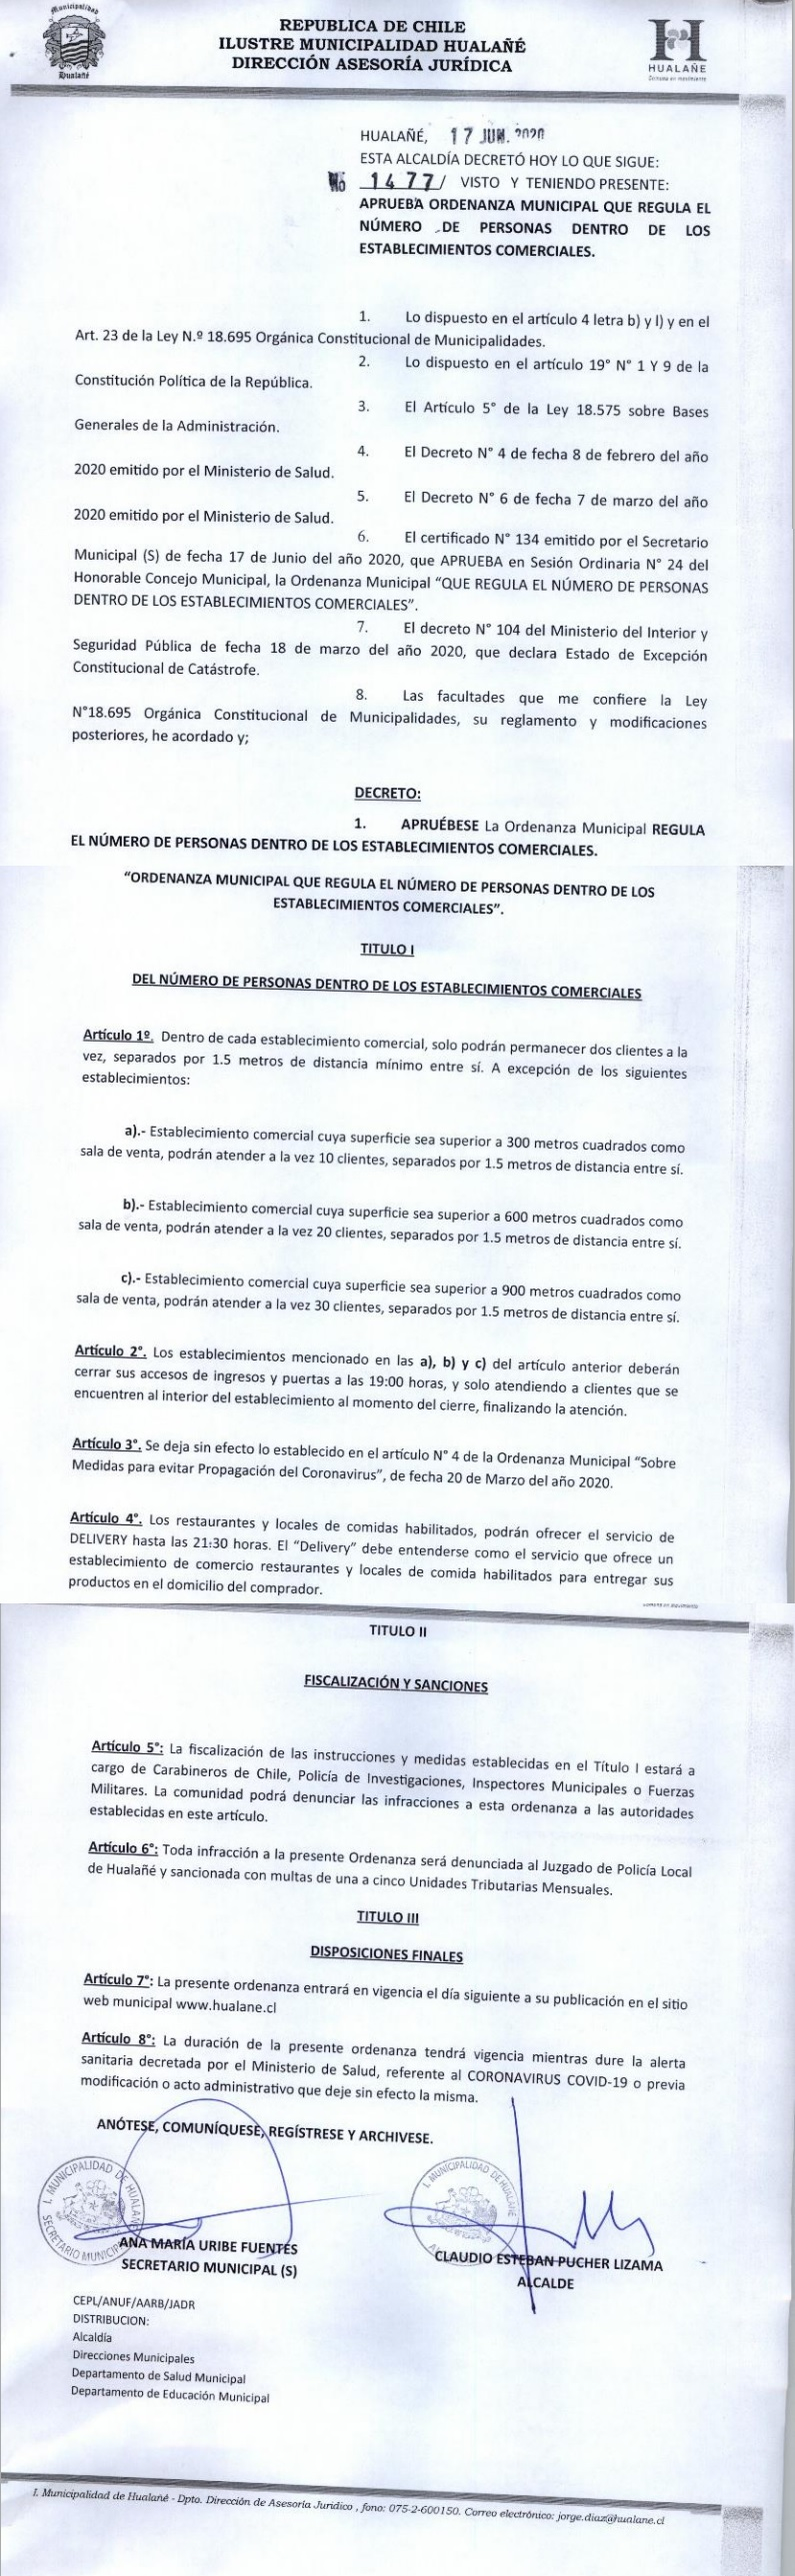 decreto 1477 ordenanza municipal que regula numero de persona